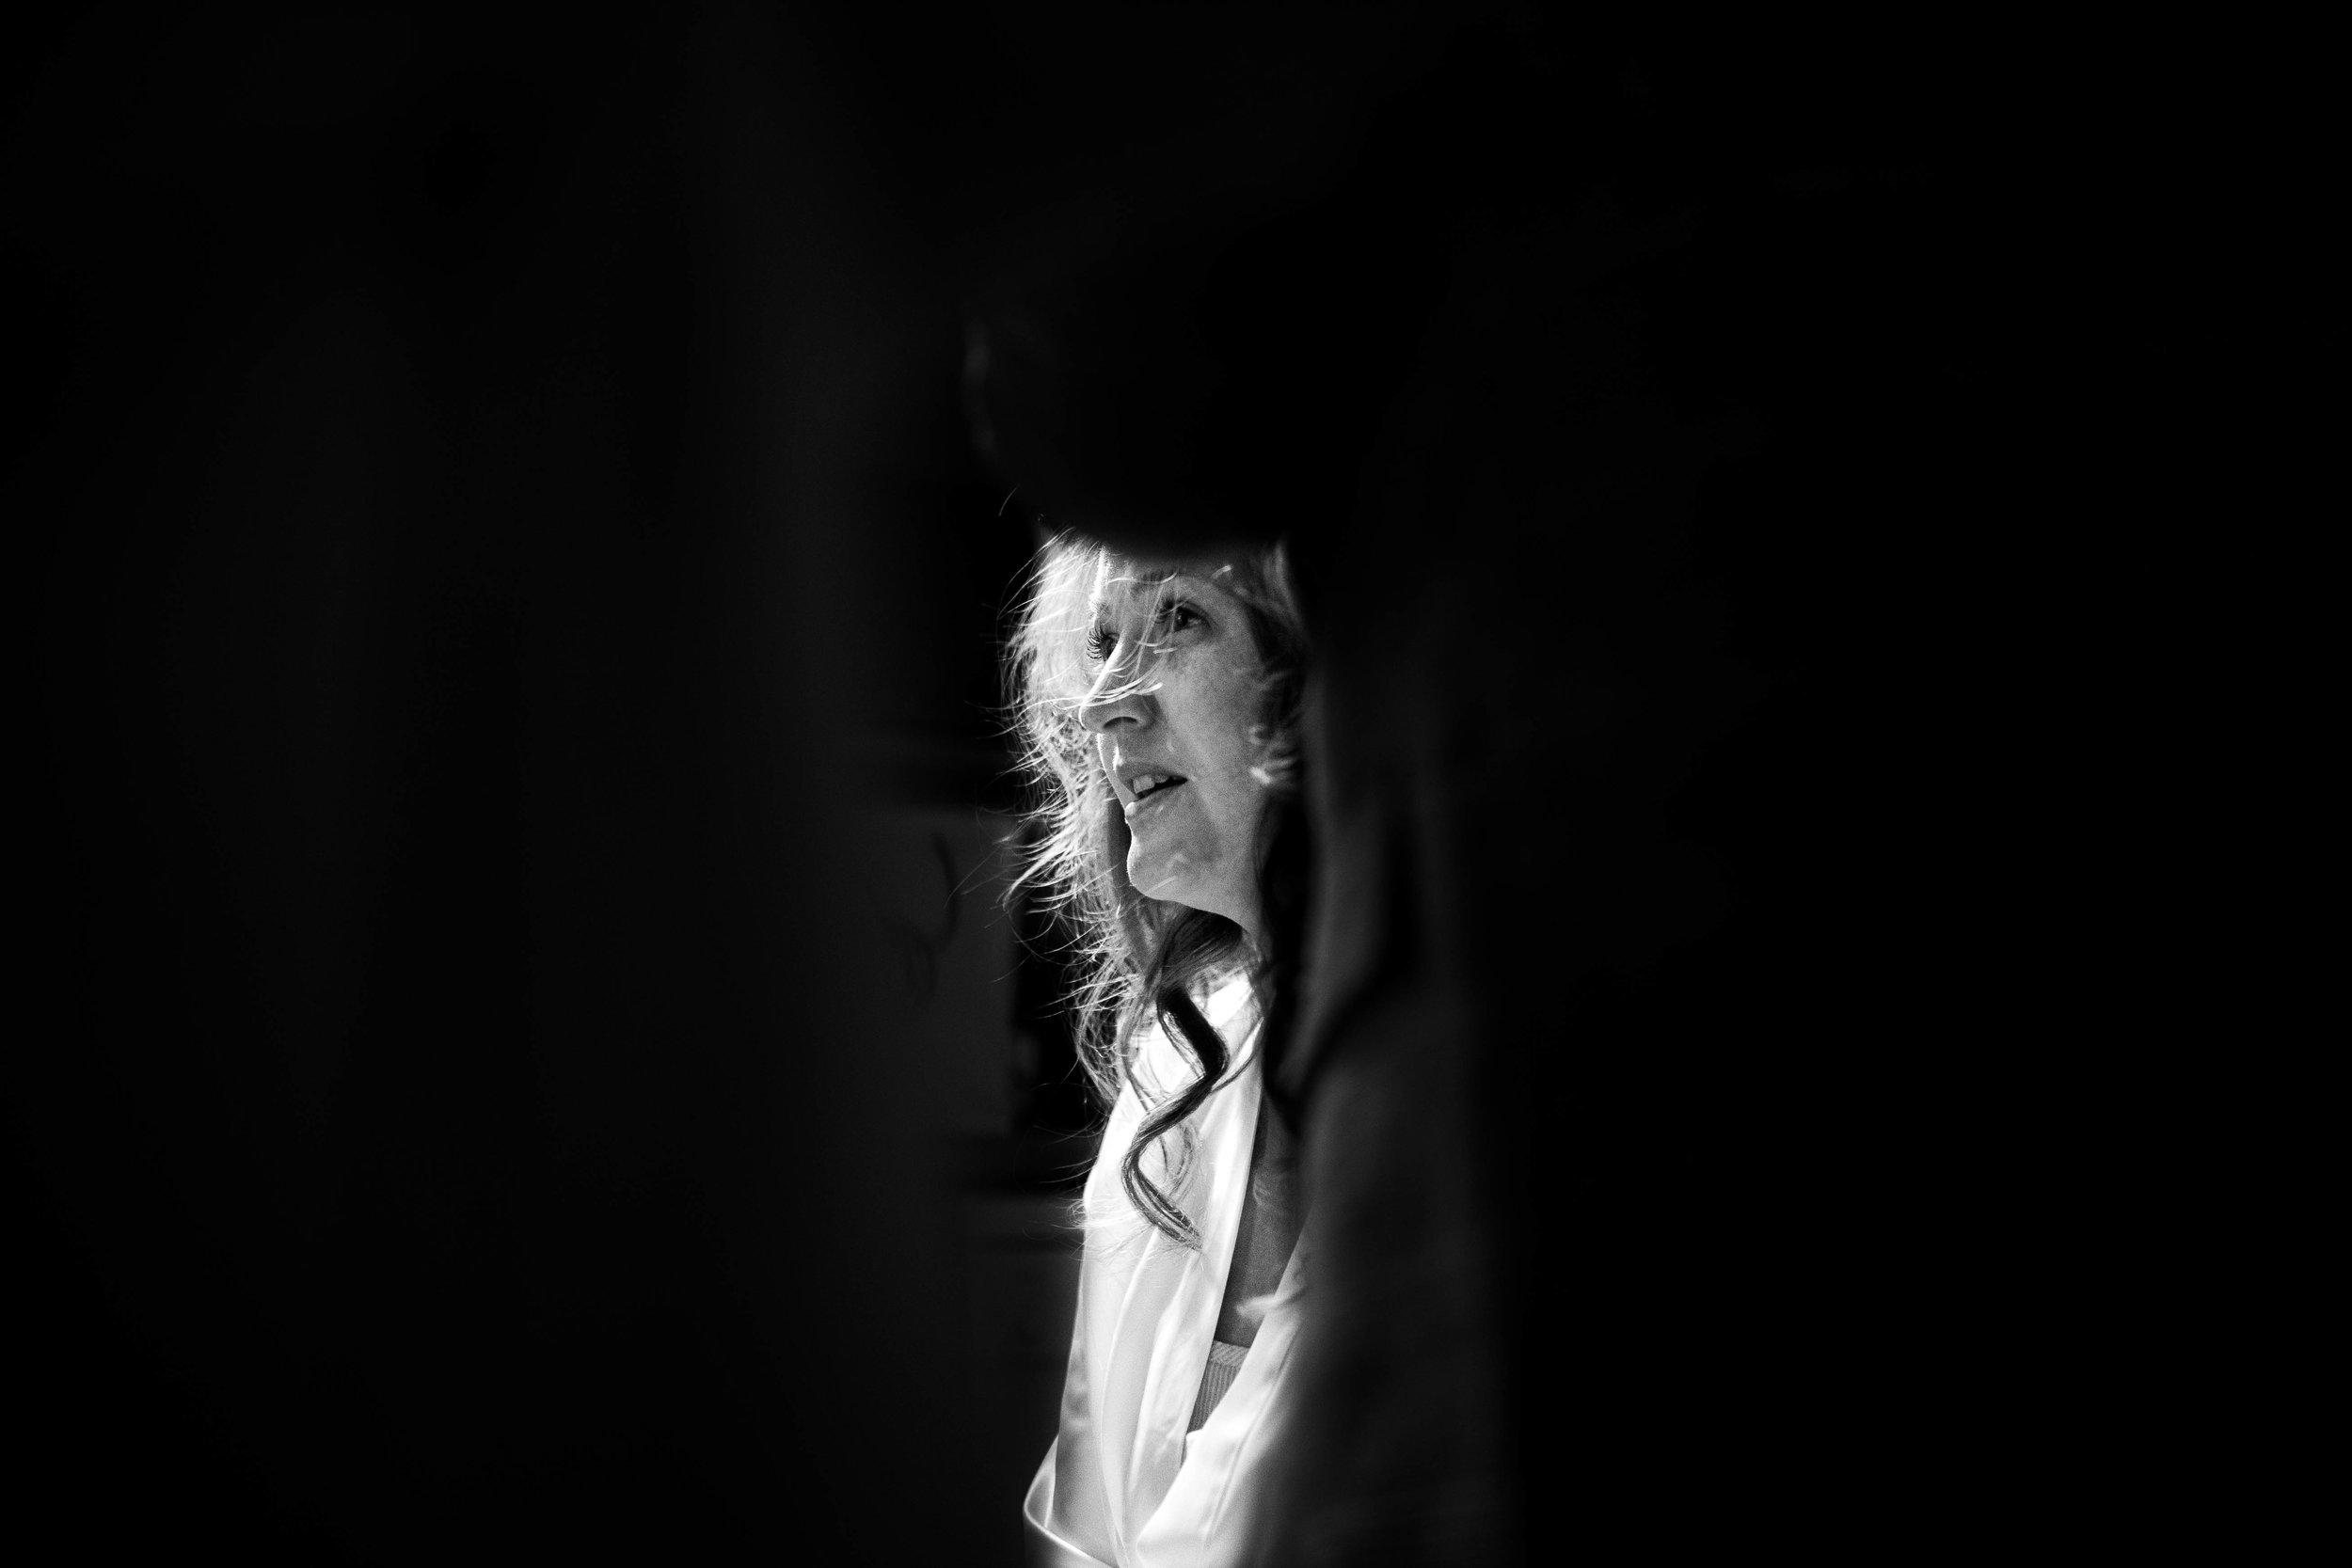 West_Mill_Darley_Abbey_Nick_Labrum_Photo_Emma&Martin_Nick_black&white-53.jpg